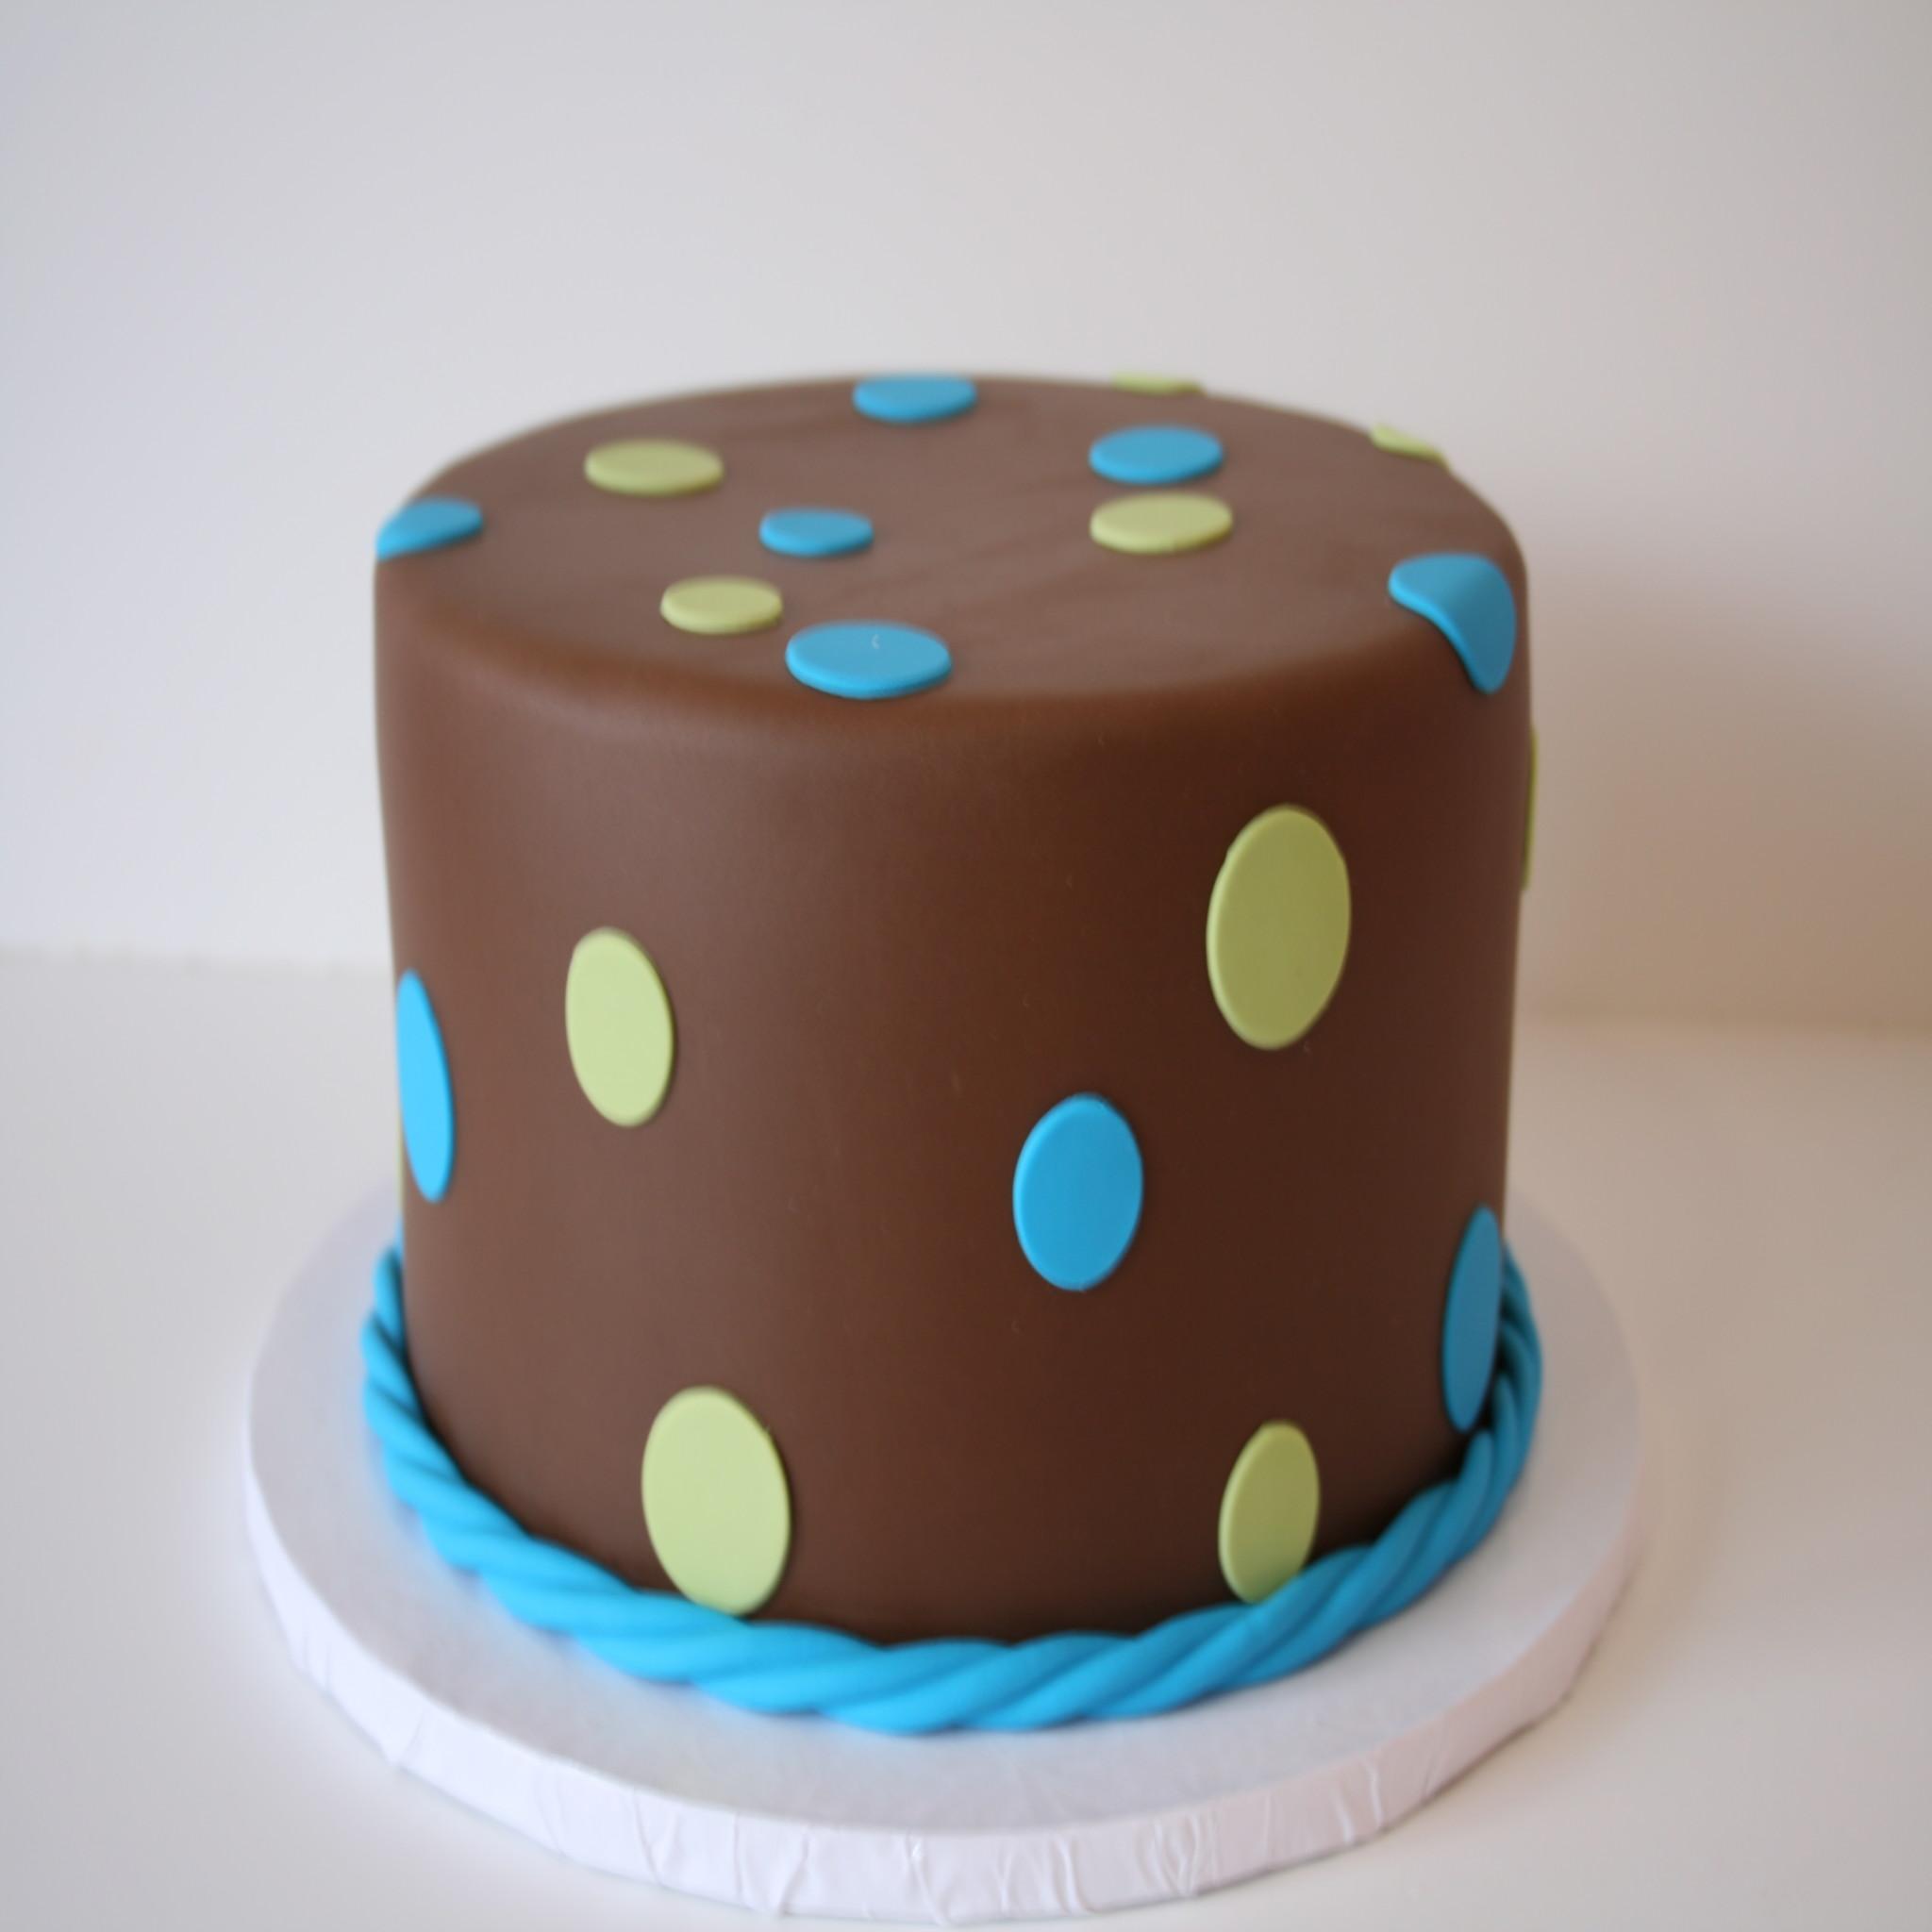 Terrific 13 No Boys Birthday Cakes Photo Boys Birthday Cake Ideas Boy Funny Birthday Cards Online Alyptdamsfinfo